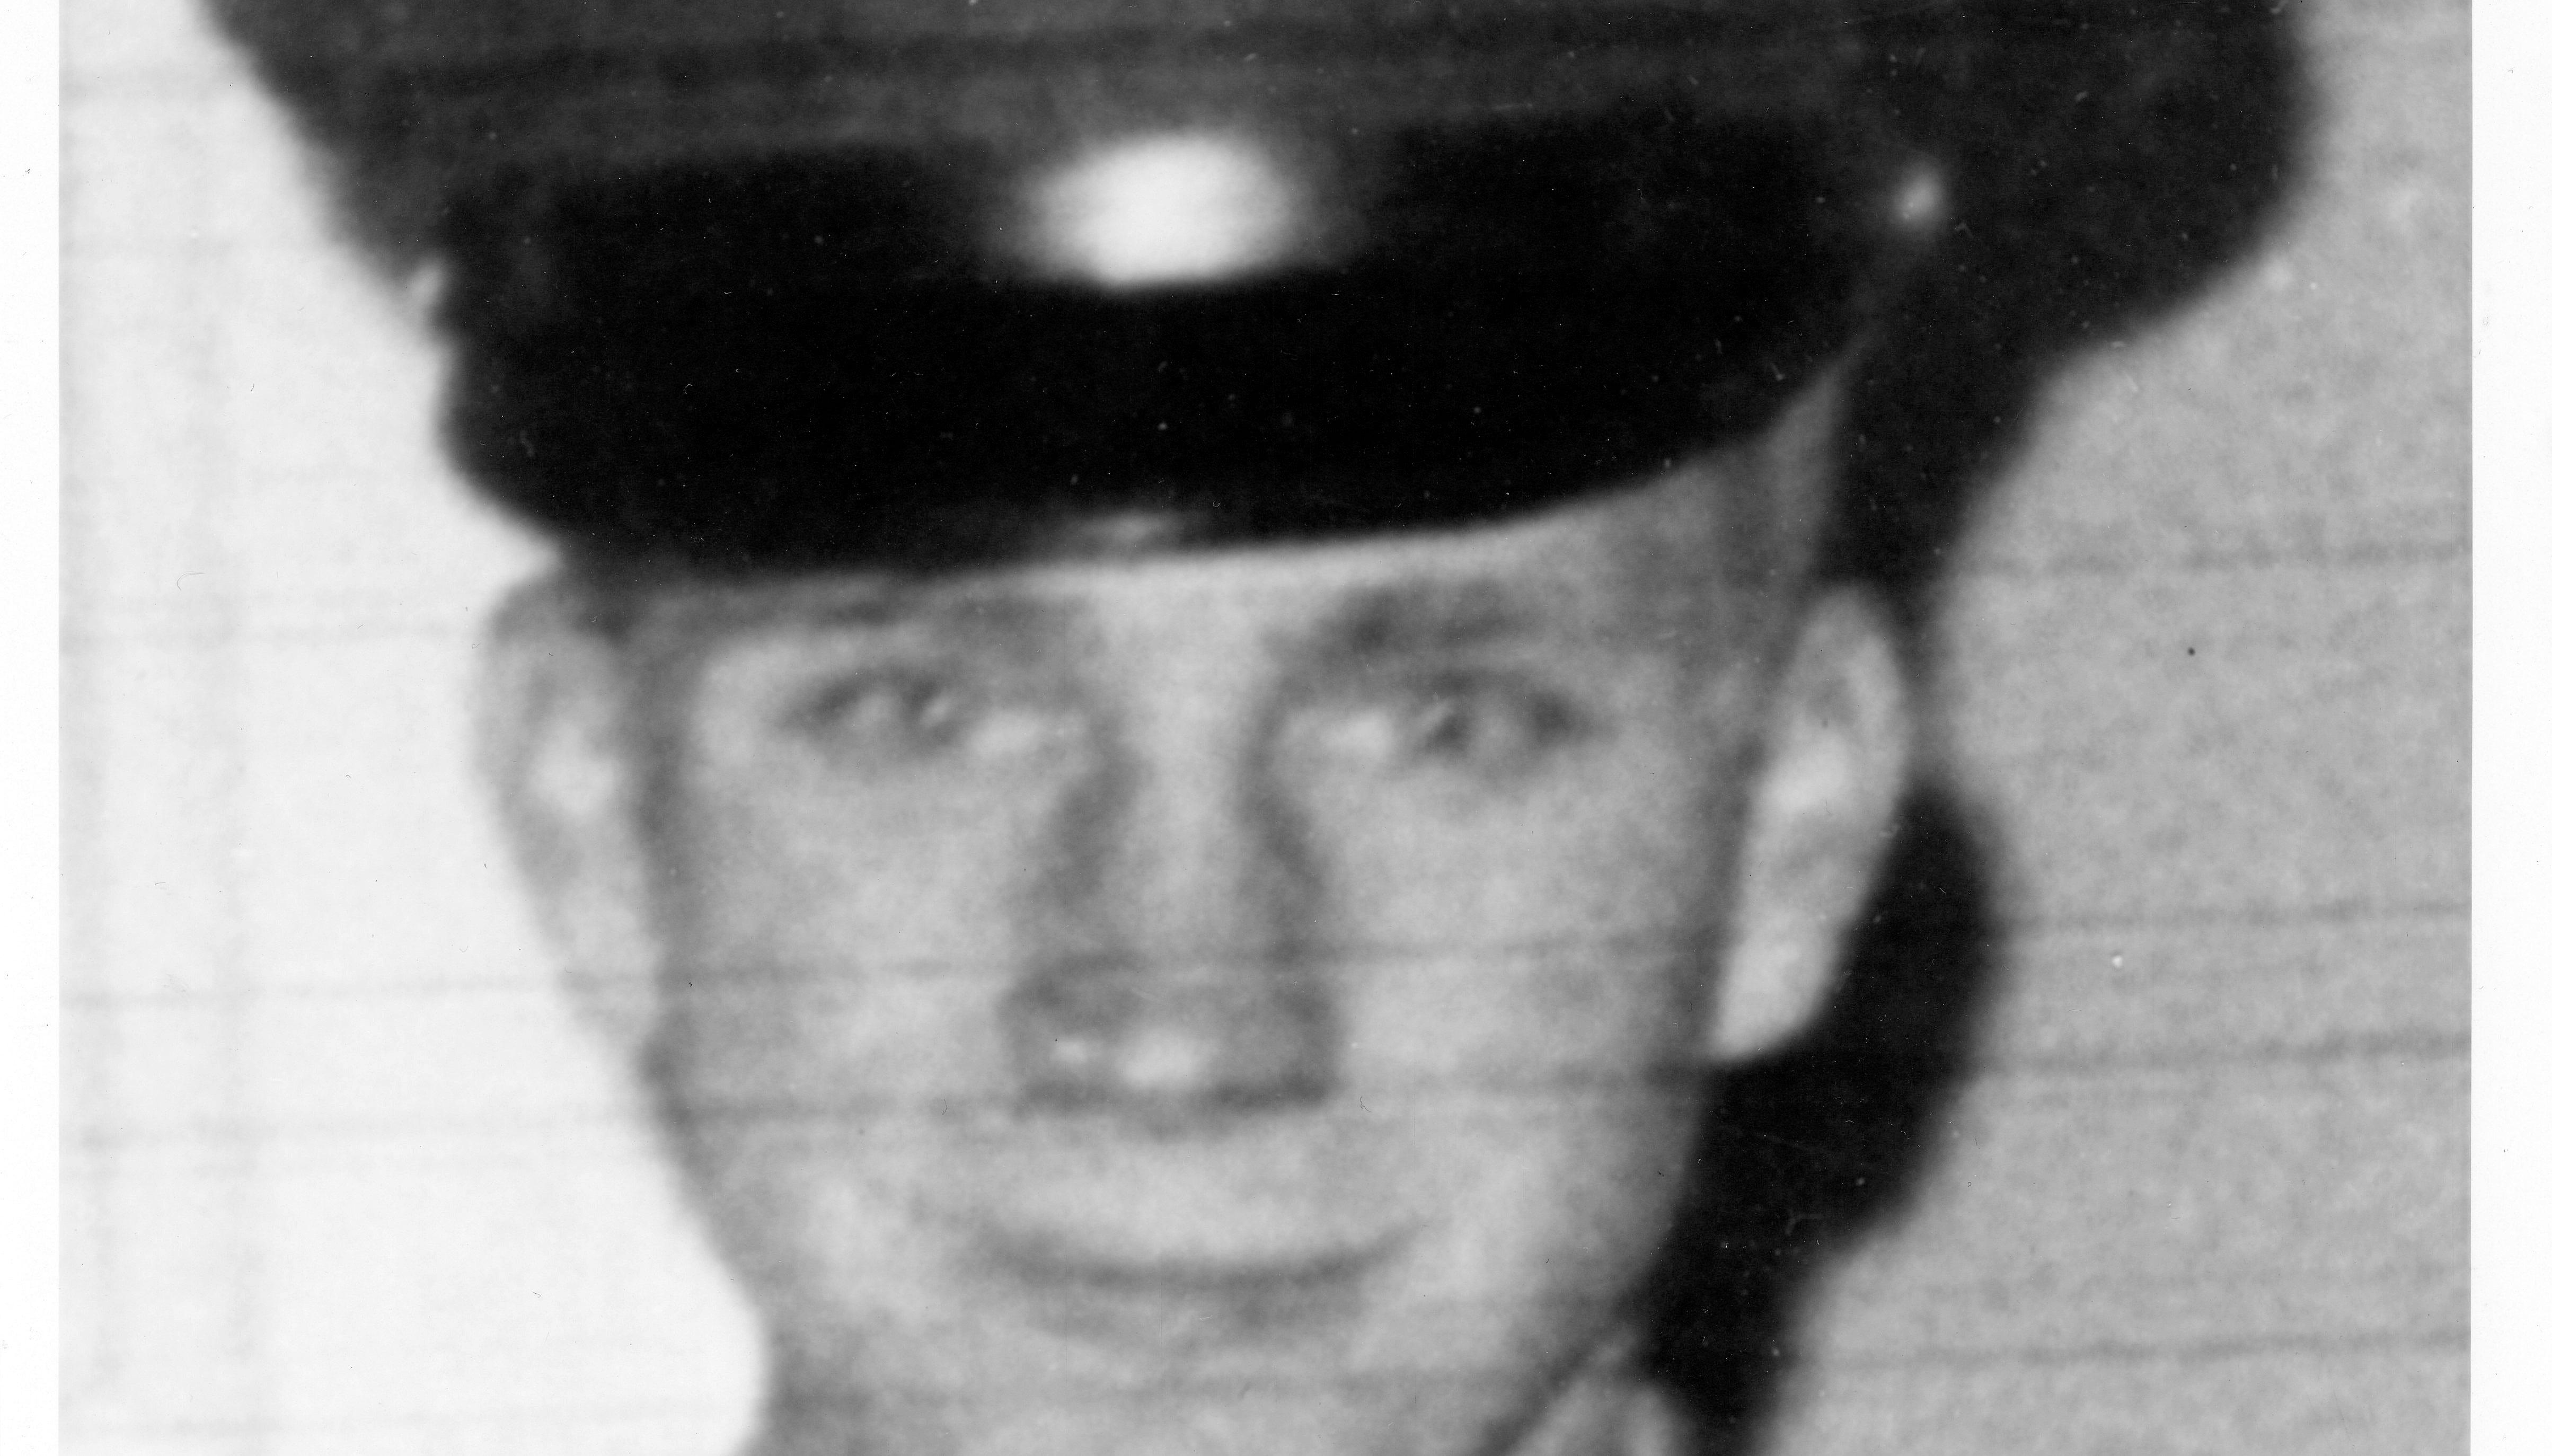 Vietnam veterans remember the sacrifice that allowed them to live